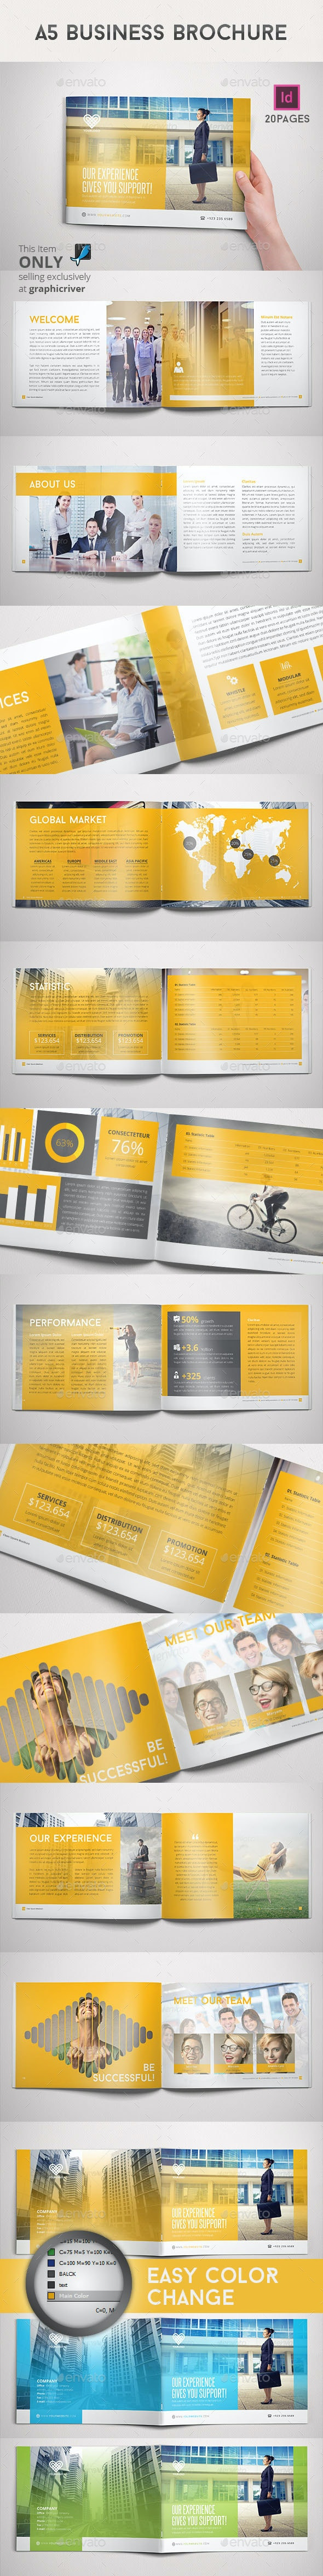 A5 Business Brochure - Corporate Brochures